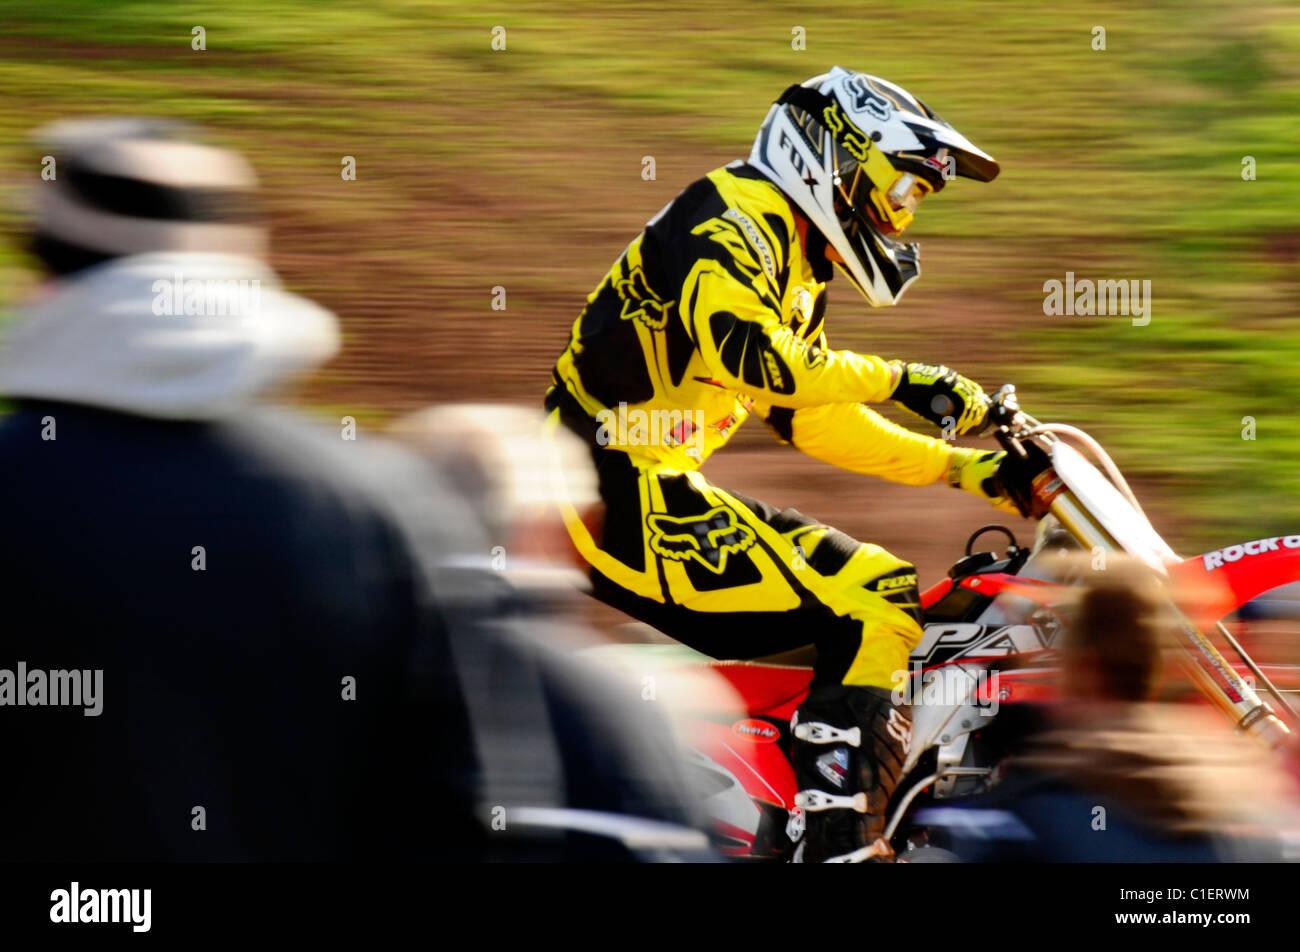 Brad Anderson - Maxxis British Motocross 2011 - Stock Image